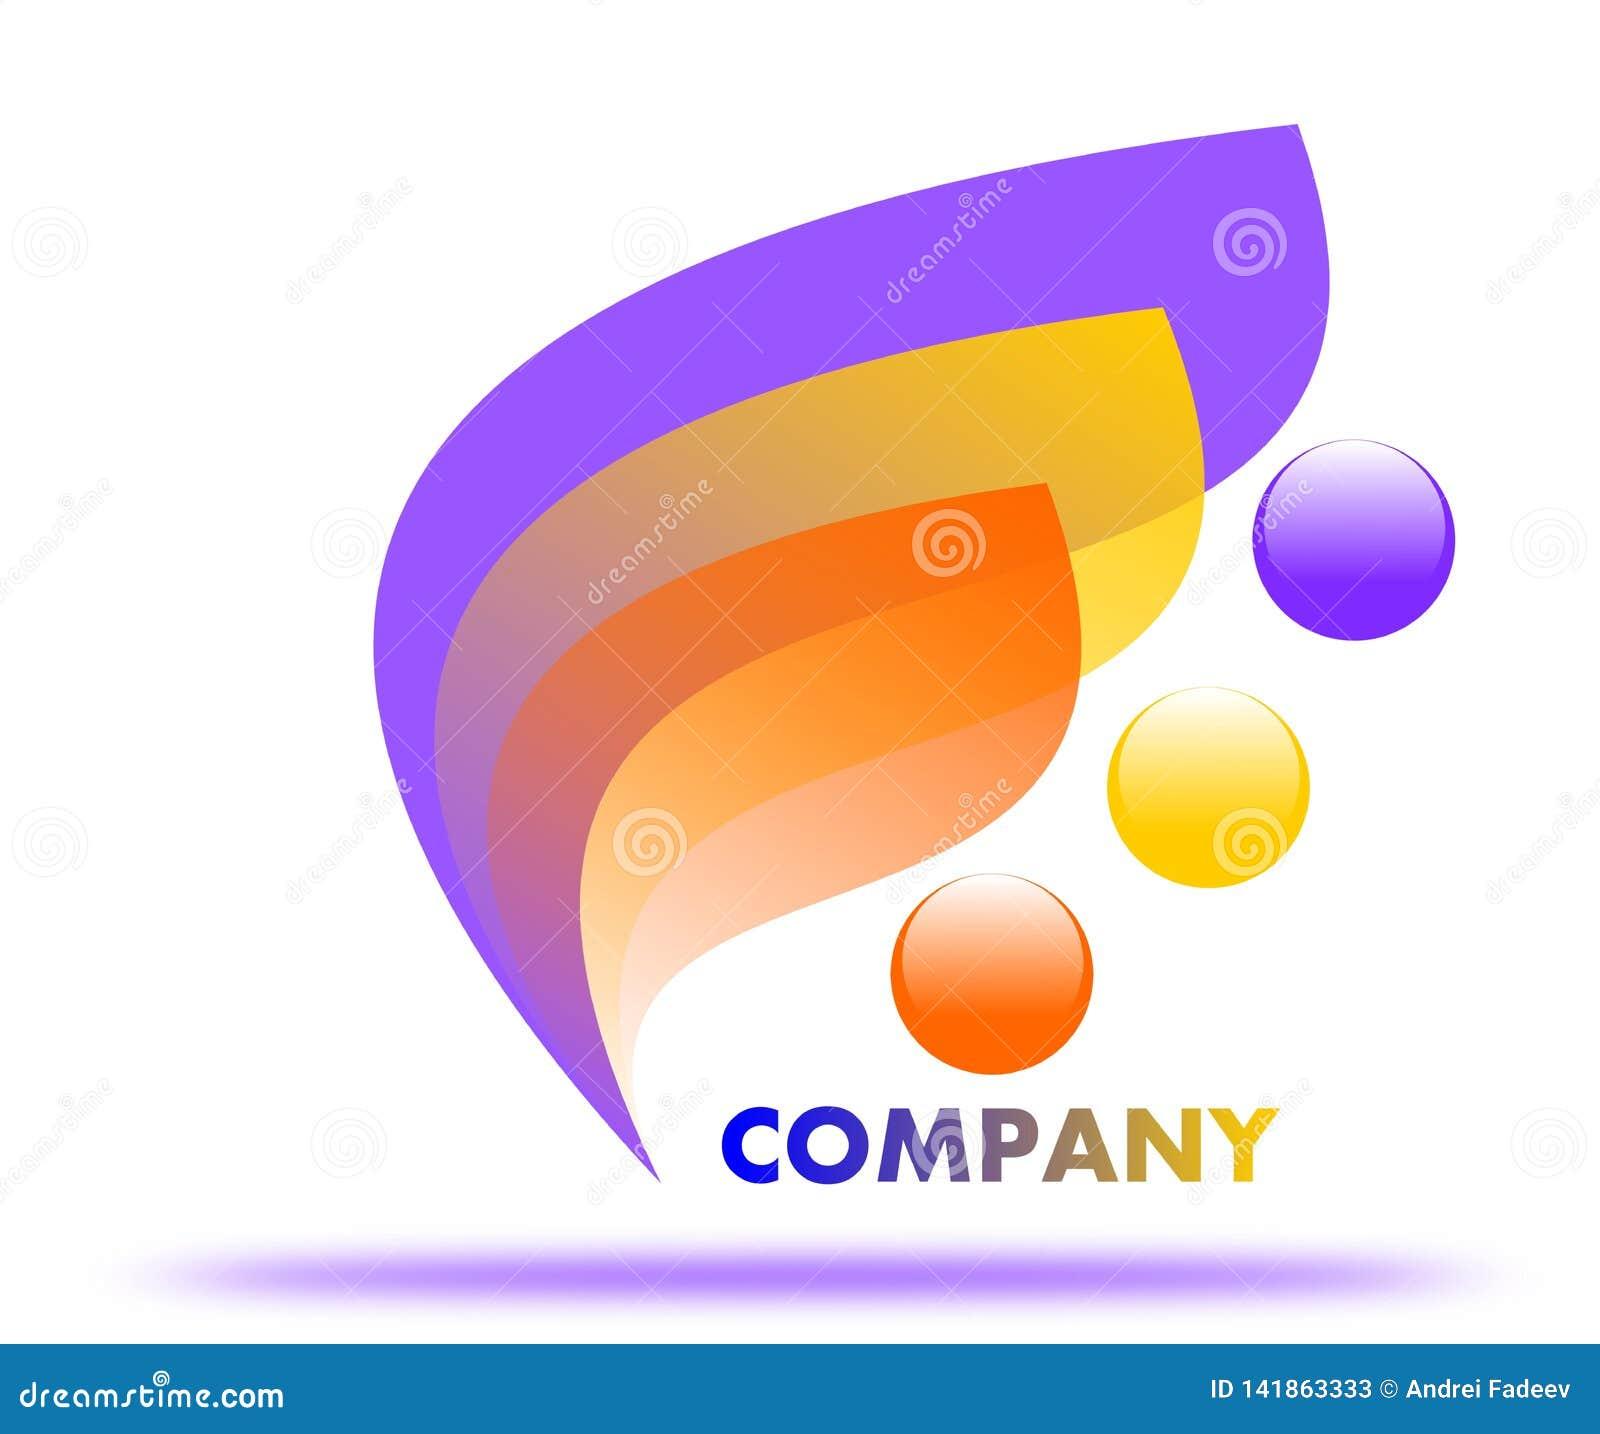 Dra tricolor företagslogo